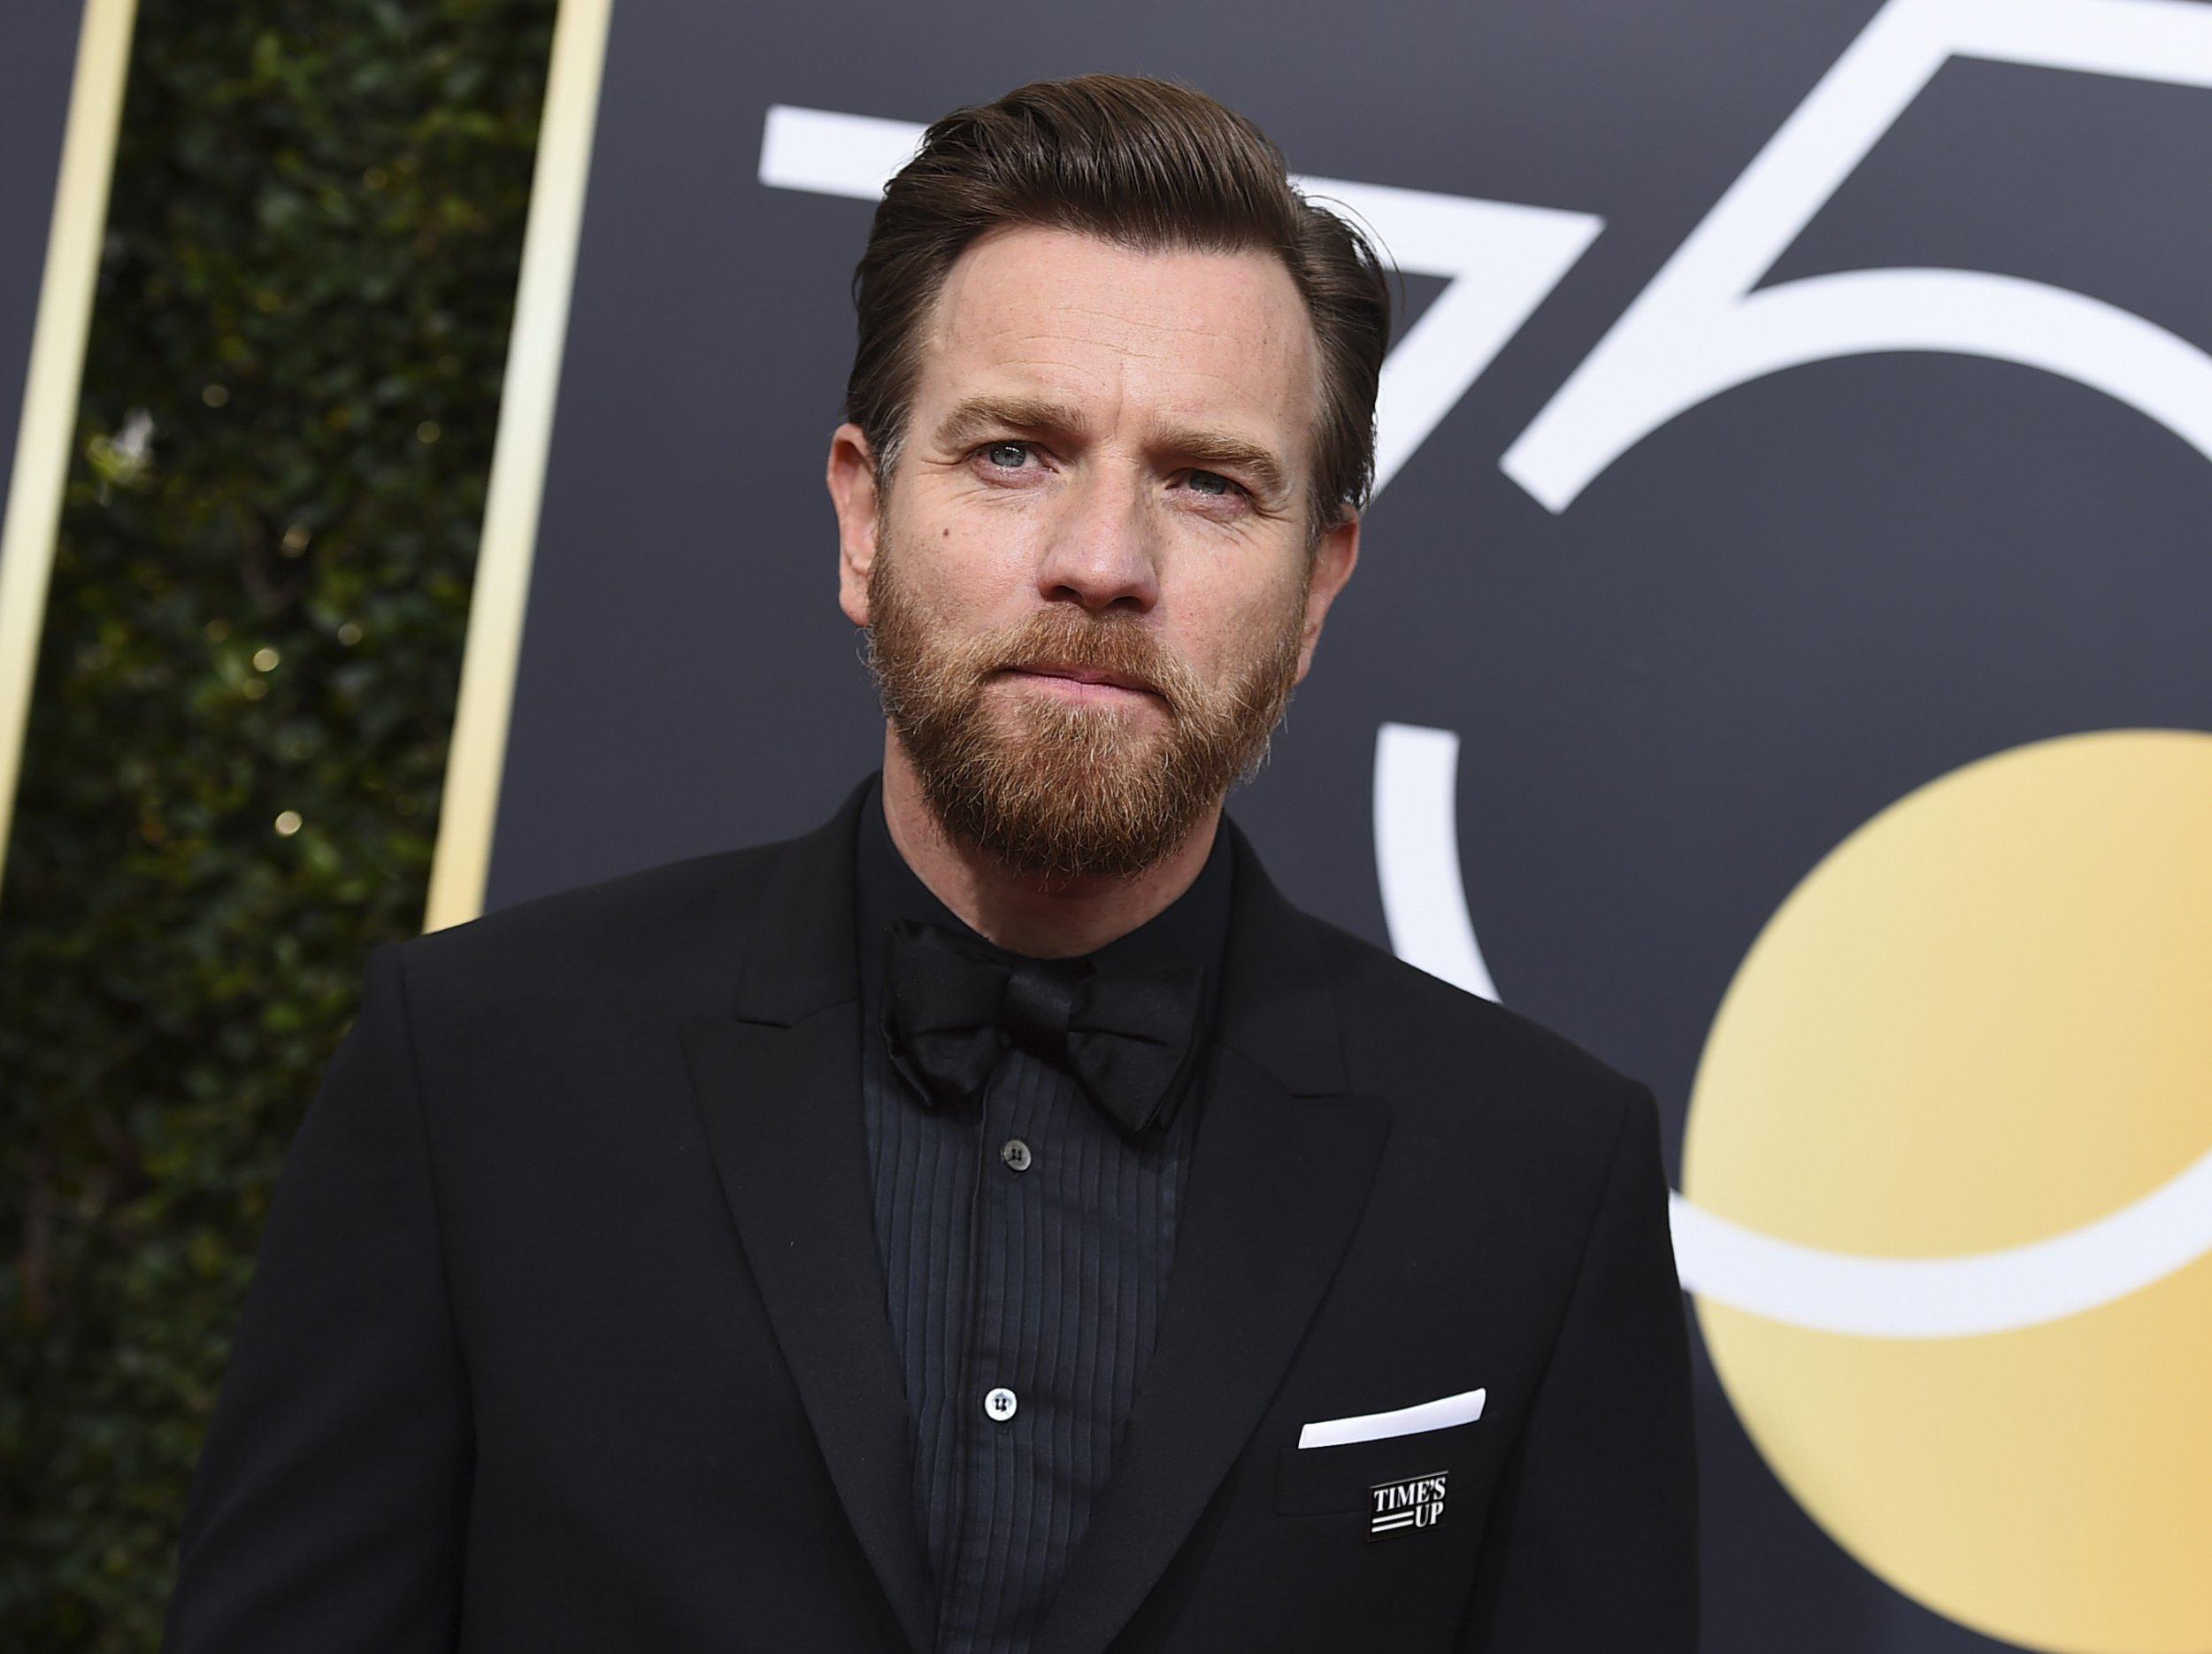 Fans are now convinced Ewan McGregor could be in Obi-Wan Kenobi Star Wars film